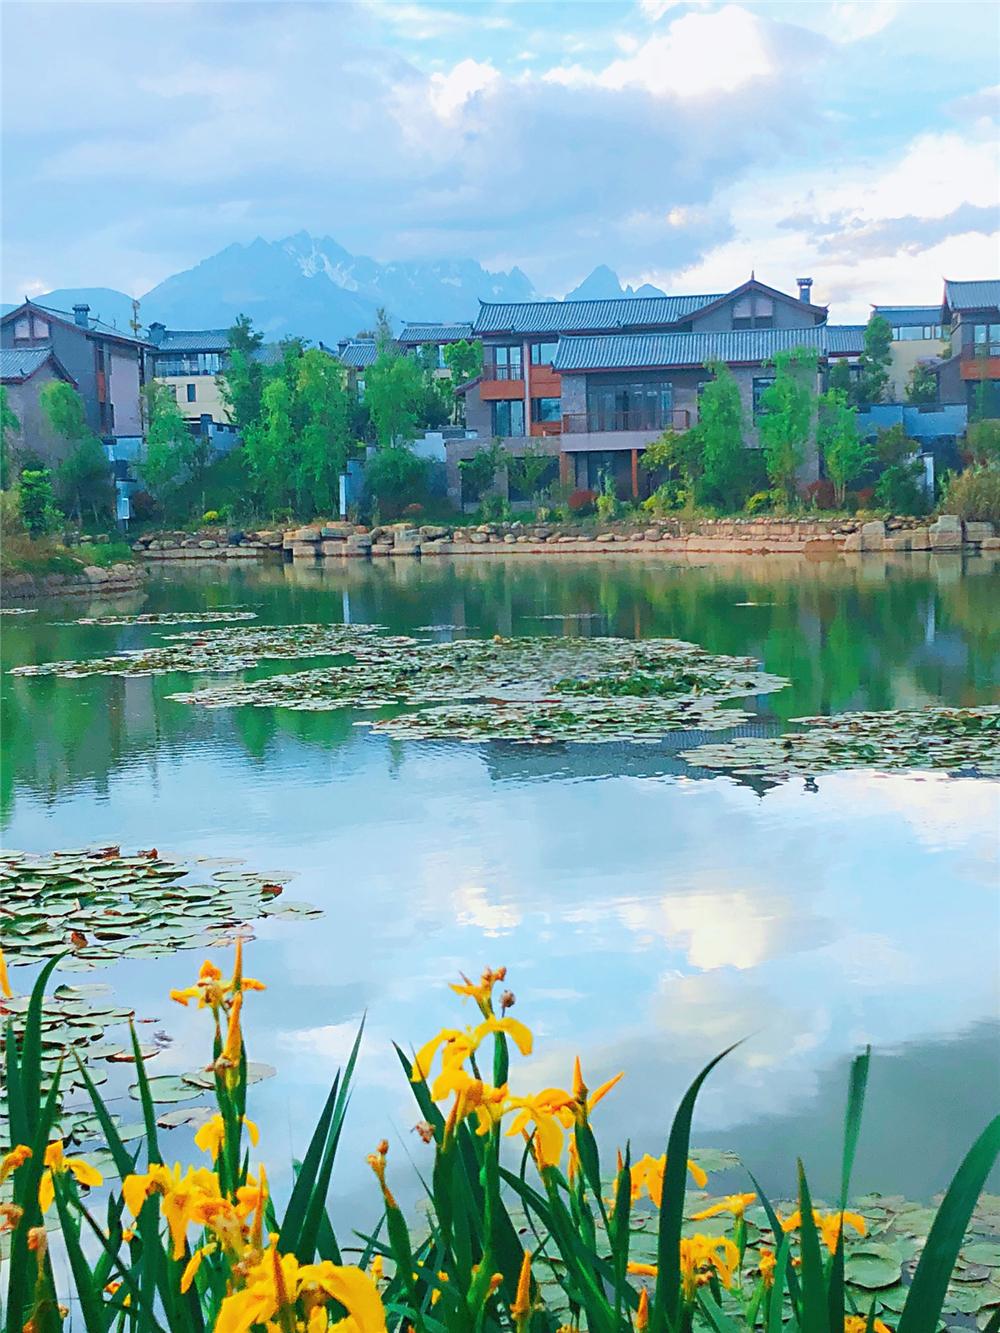 http://yuefangwangimg.oss-cn-hangzhou.aliyuncs.com/uploads/20200429/c921f6b003528adb7d25a565c223a38aMax.jpg